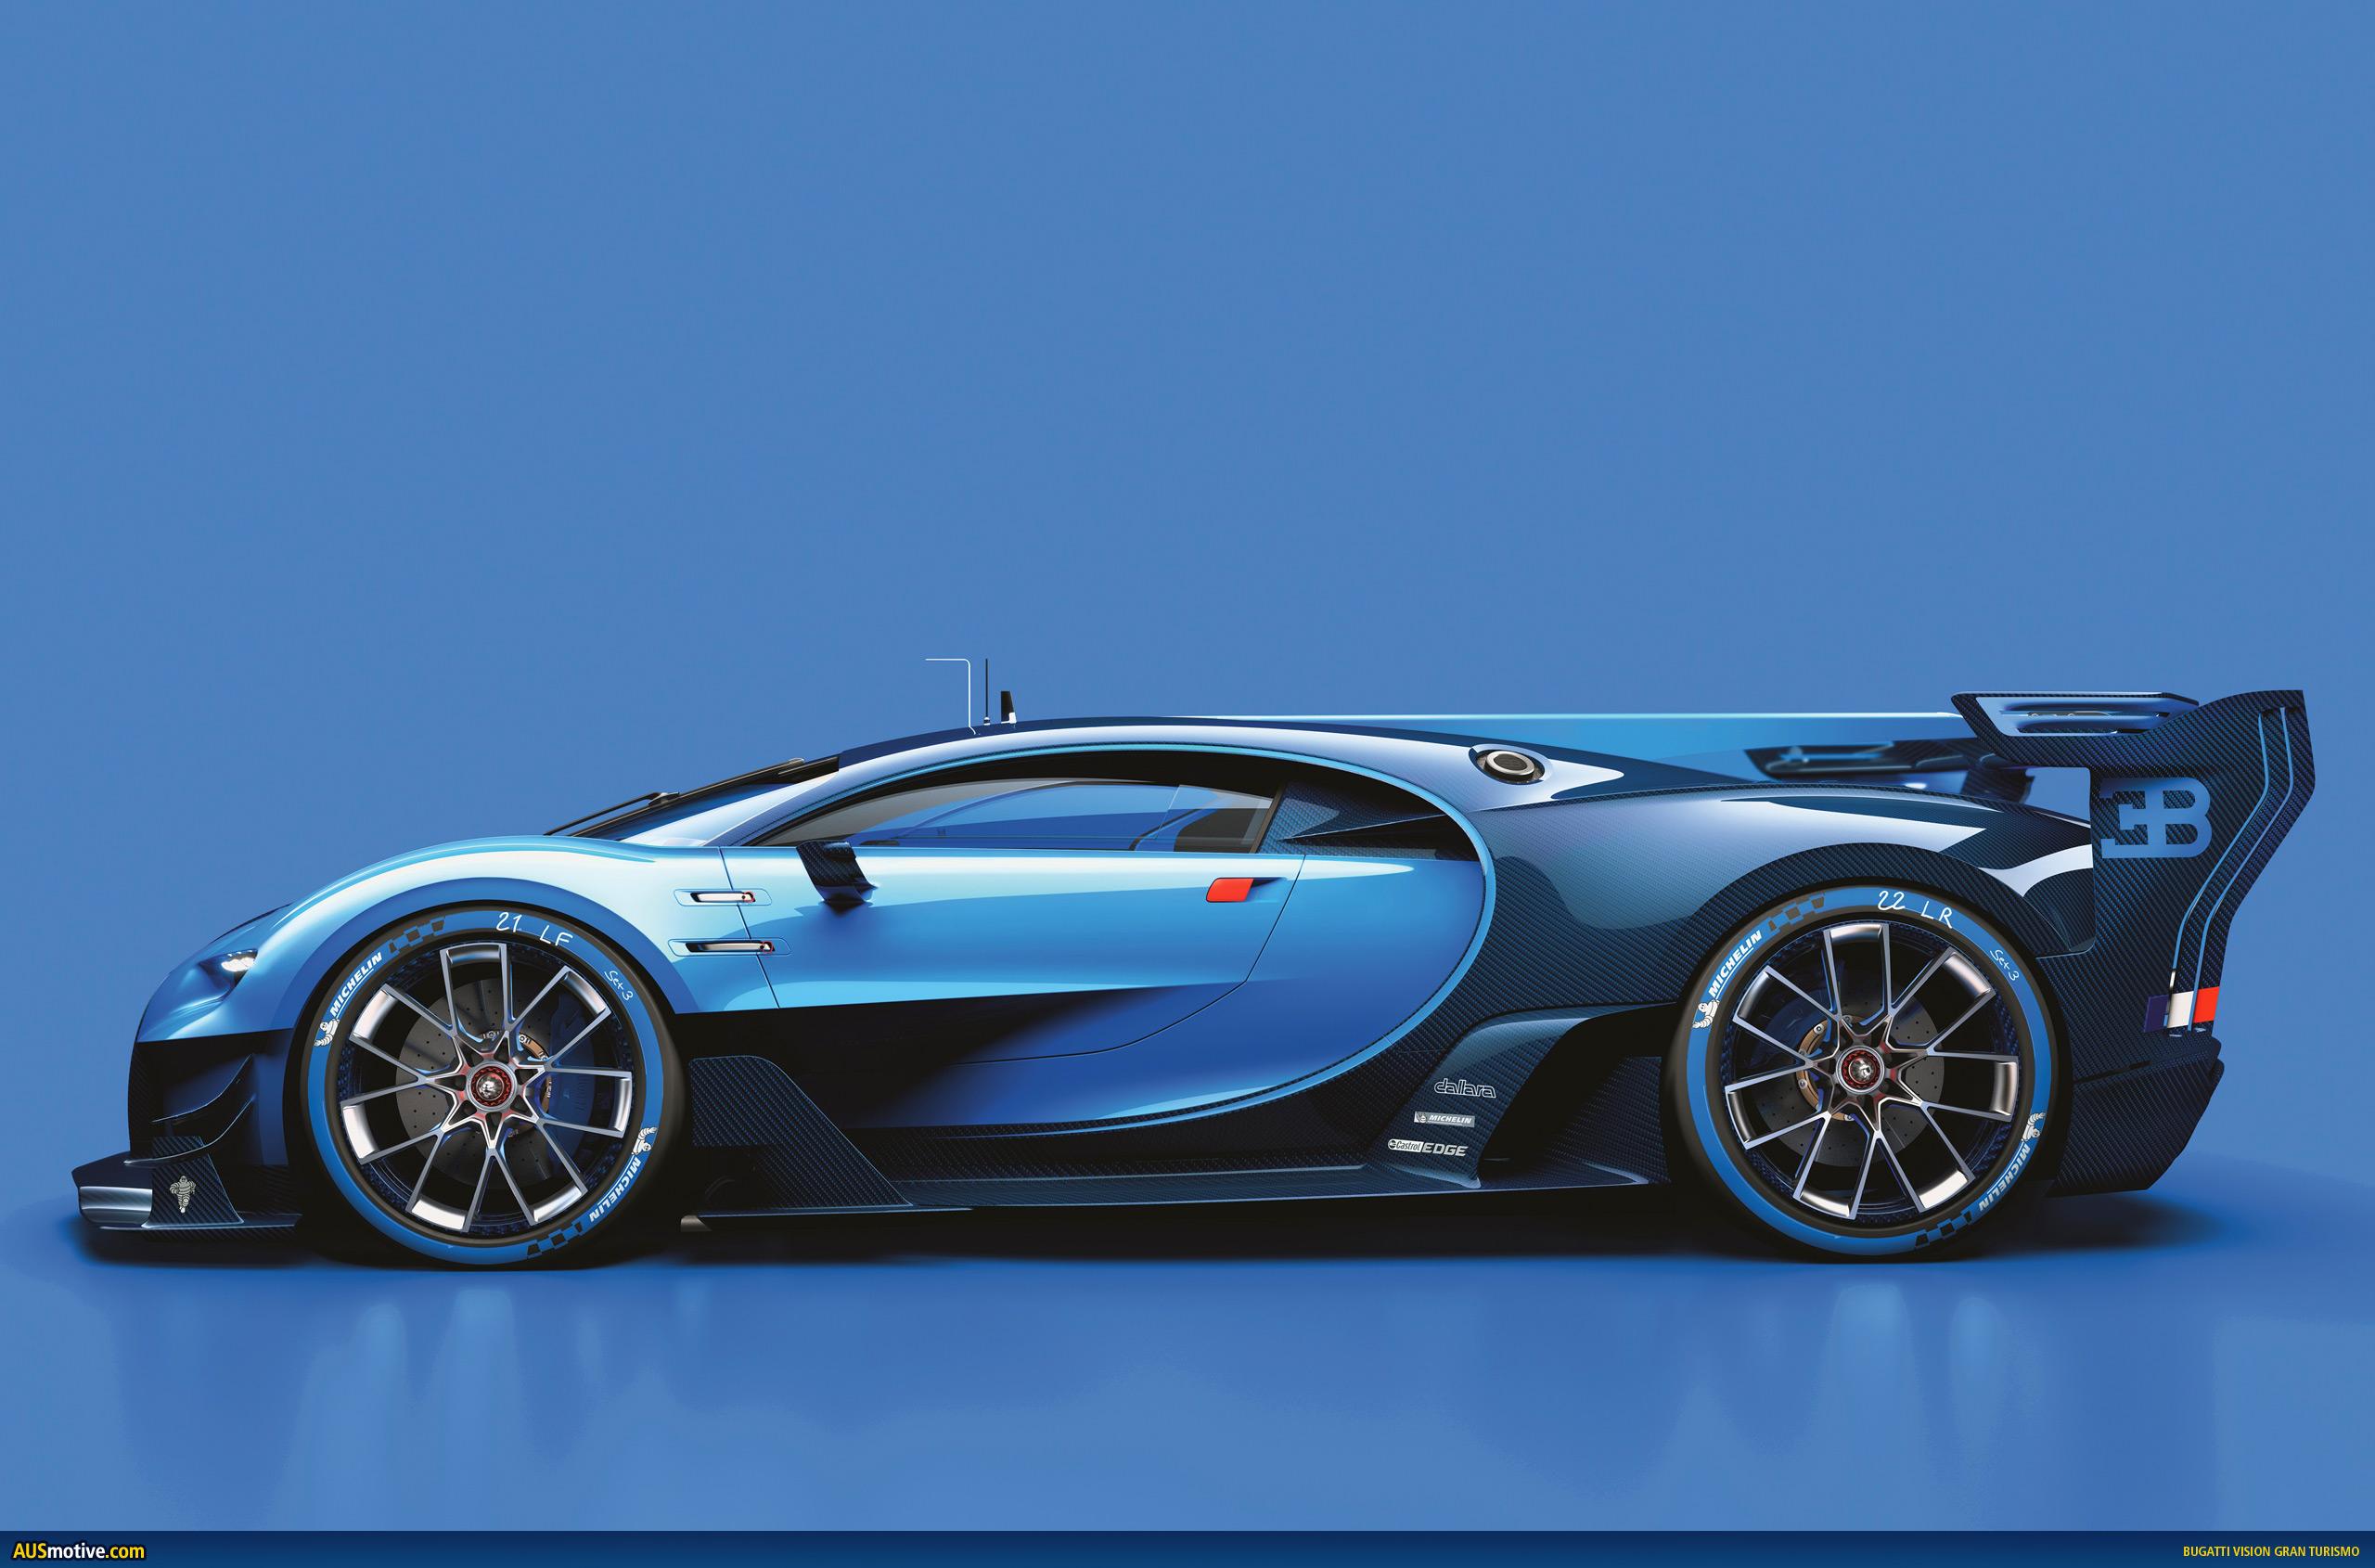 Bugatti Veyron Going Back To The Future Art Promo: AUSmotive.com » Bugatti Chiron Previewed In Gaming Fantasy?